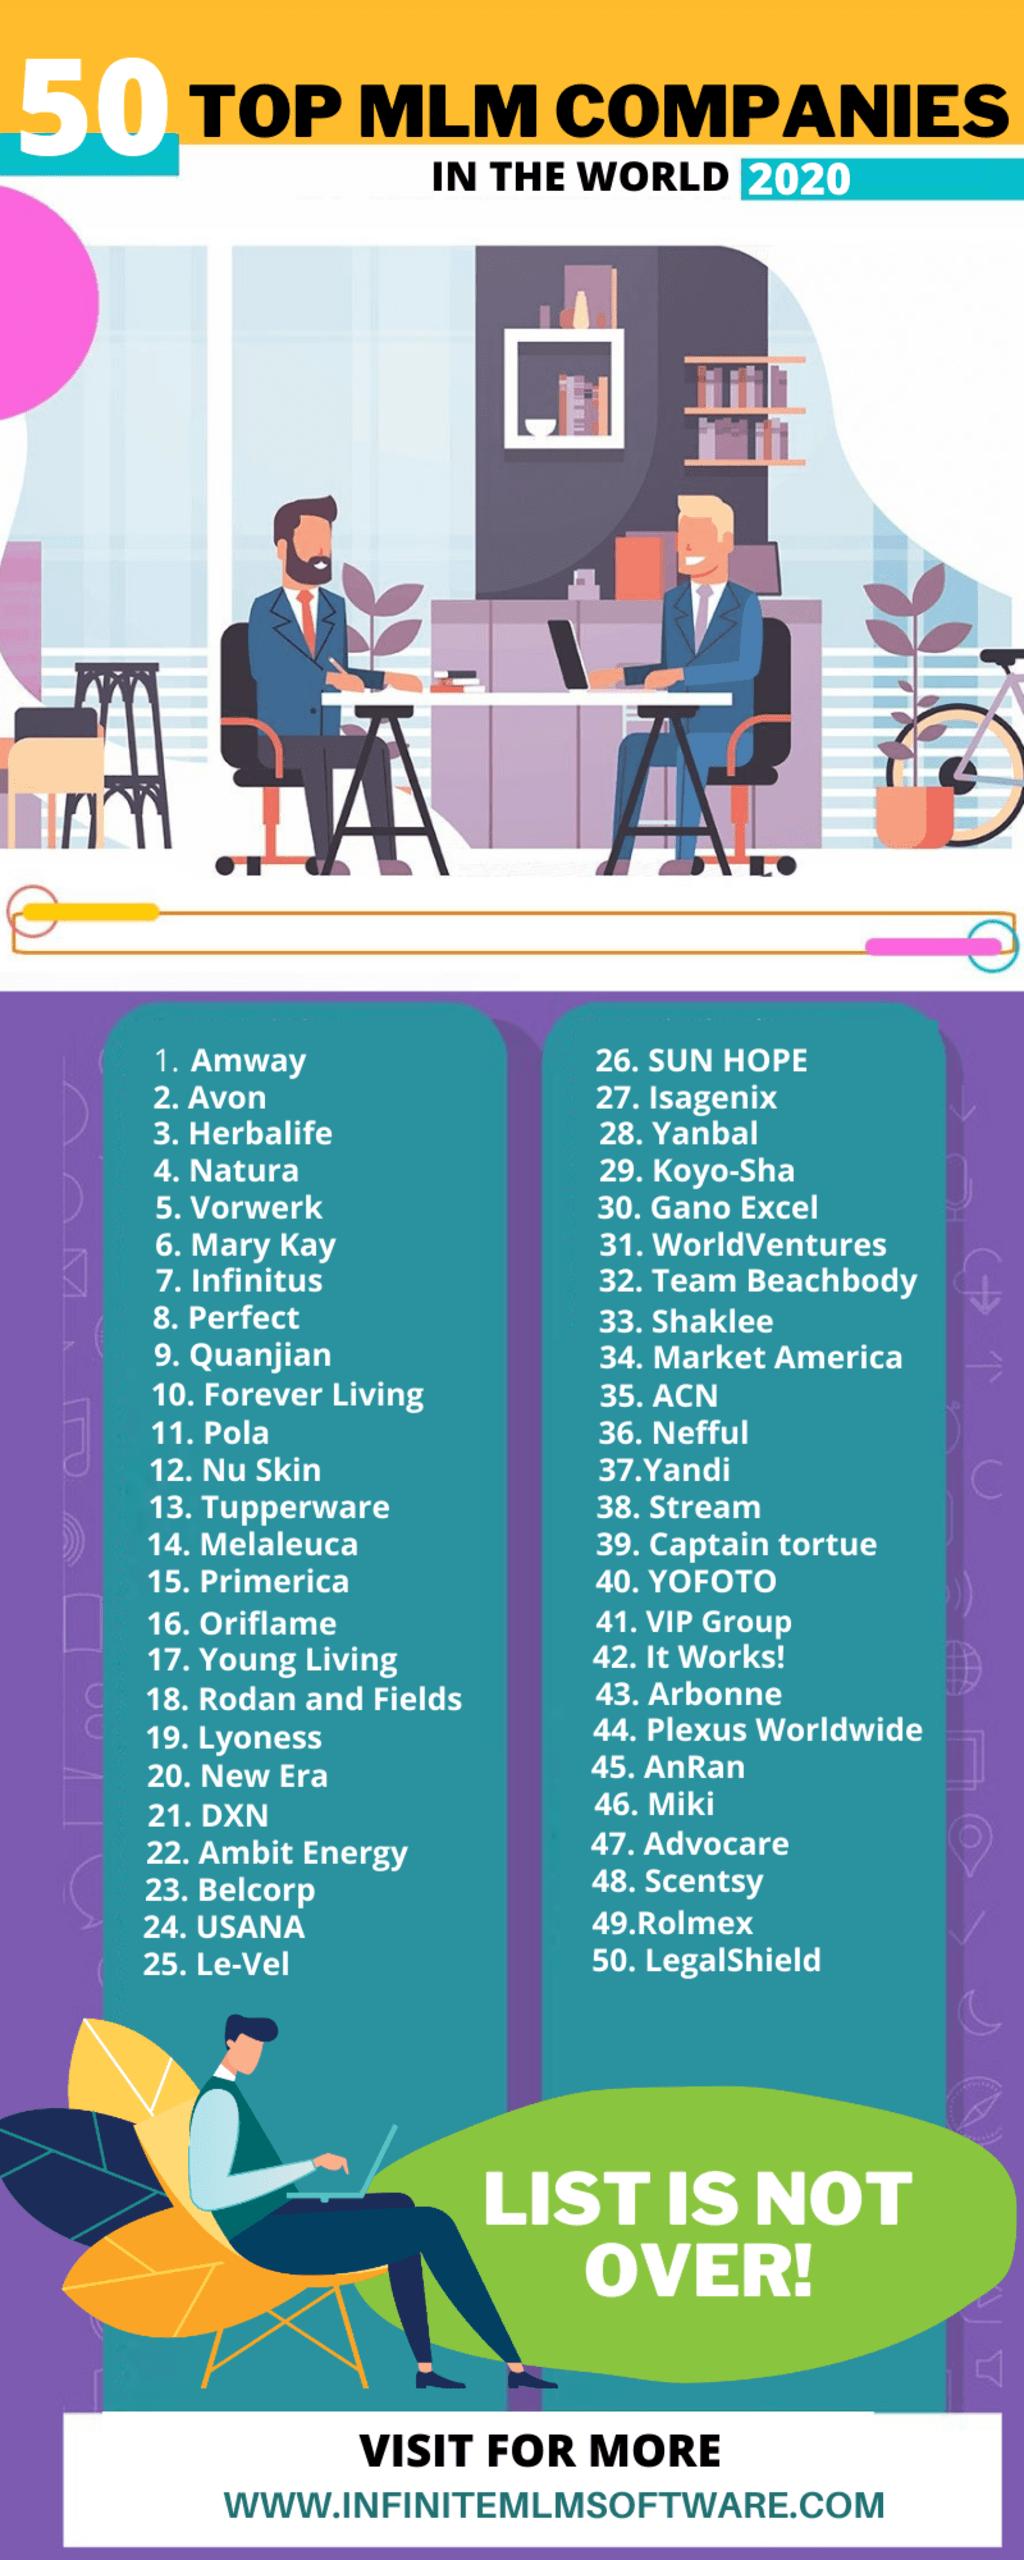 List of Top 50 MLM Companies 2020 - Infographics via Infinite MLM Software